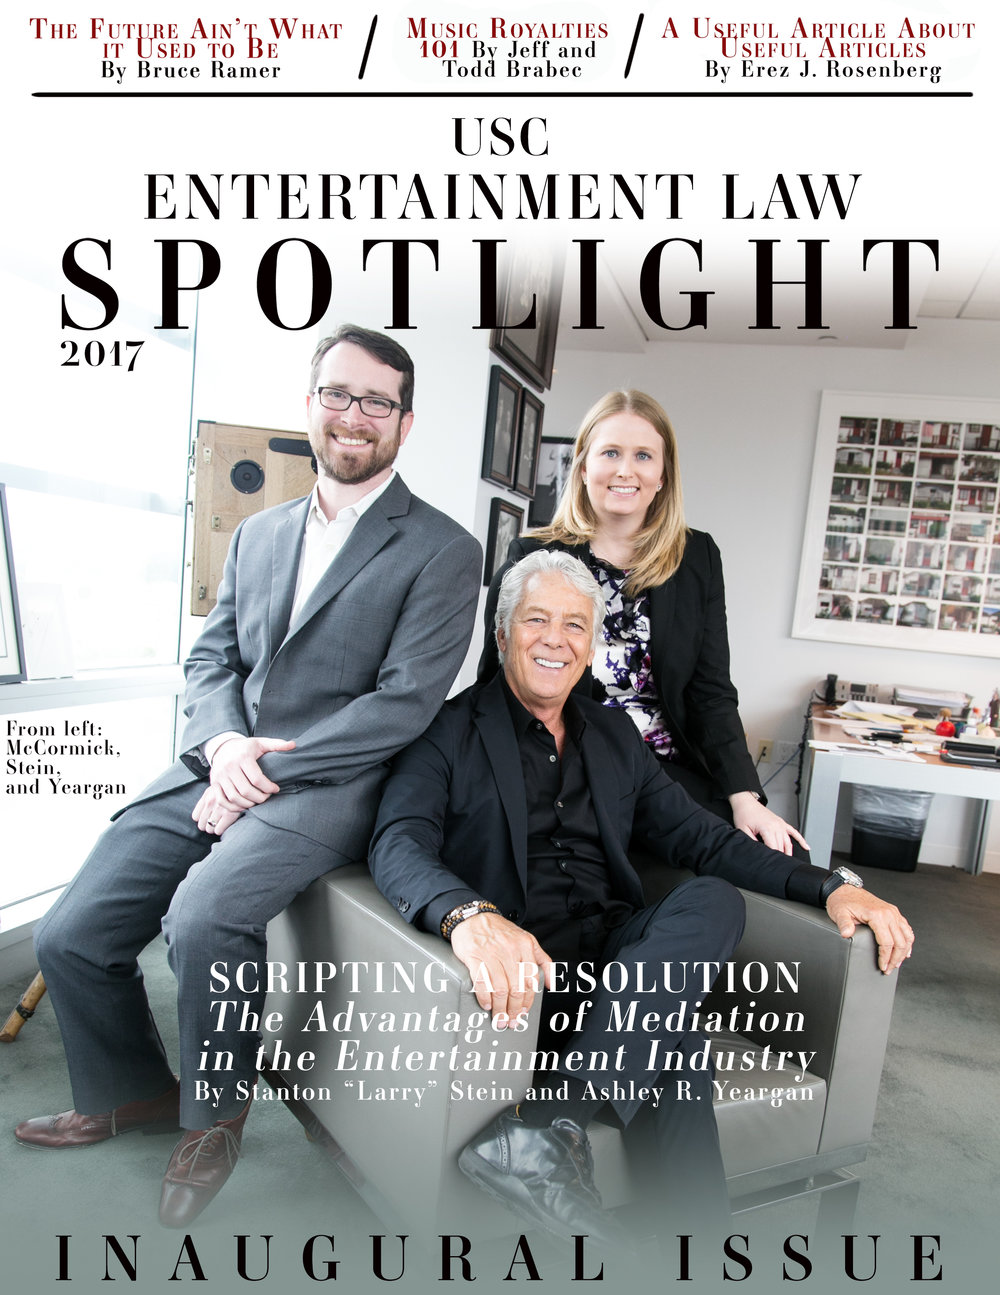 COVER-INAUGURAL ISSUE-2.jpg